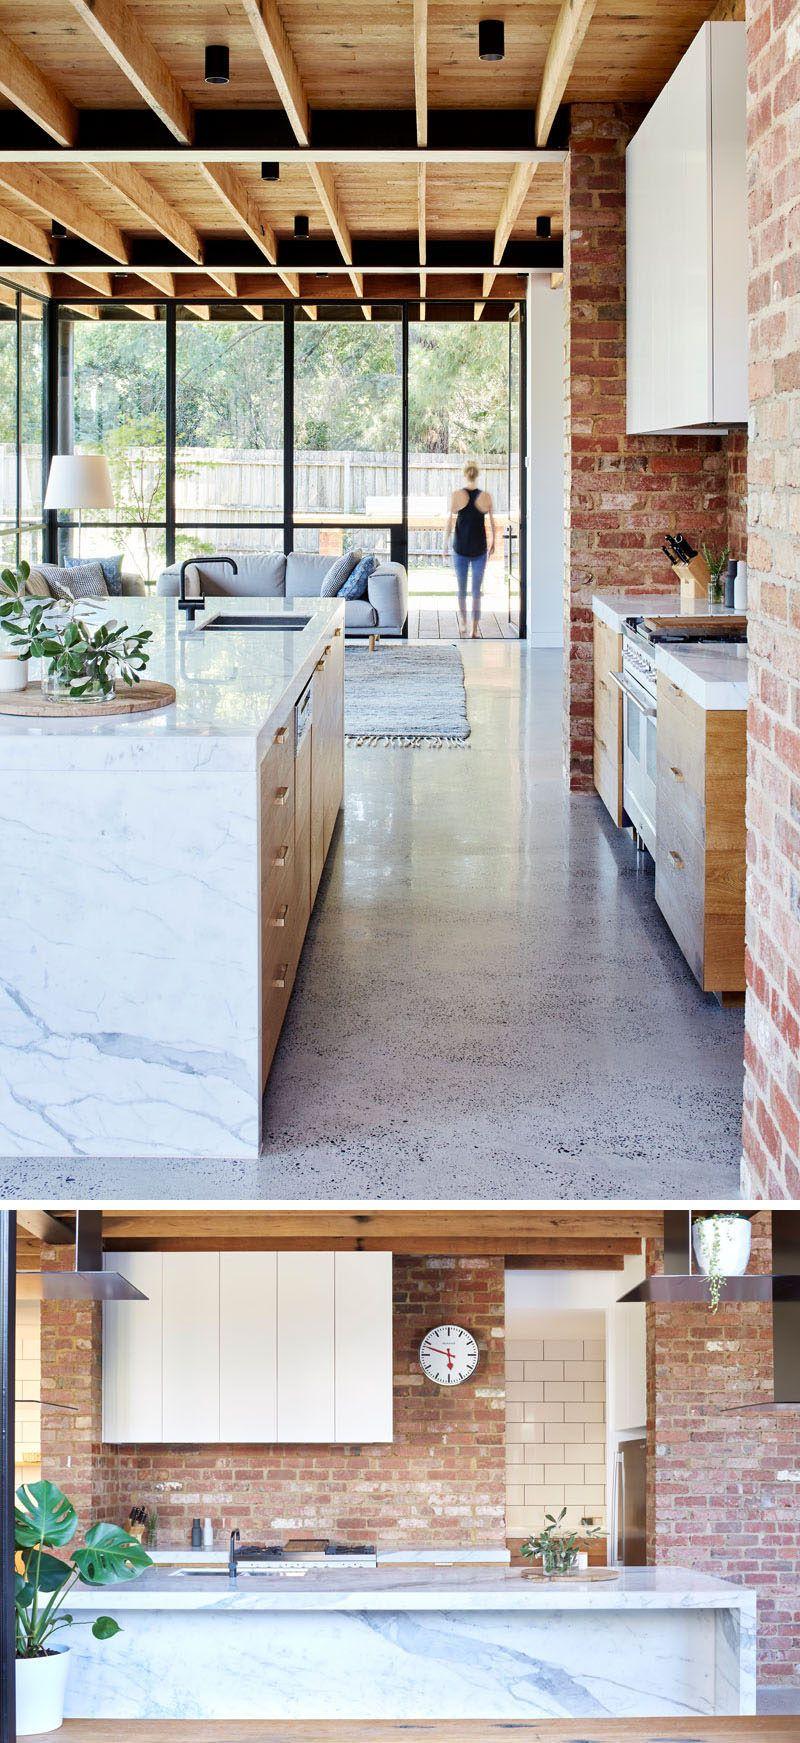 Pin by lisa nicole on interiors pinterest countertops bricks